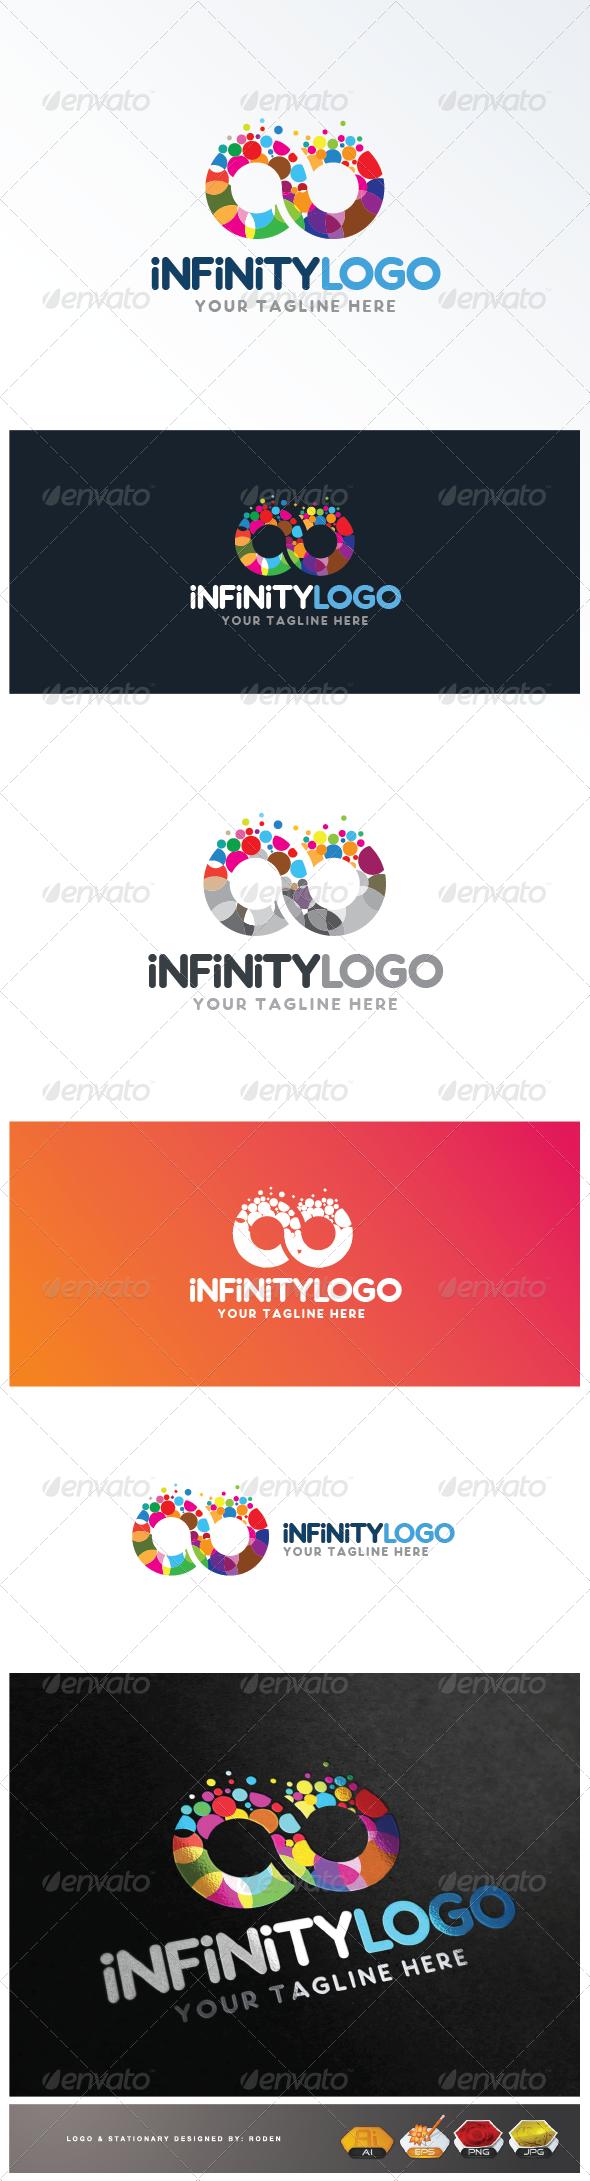 GraphicRiver Infinity Logo 3399683